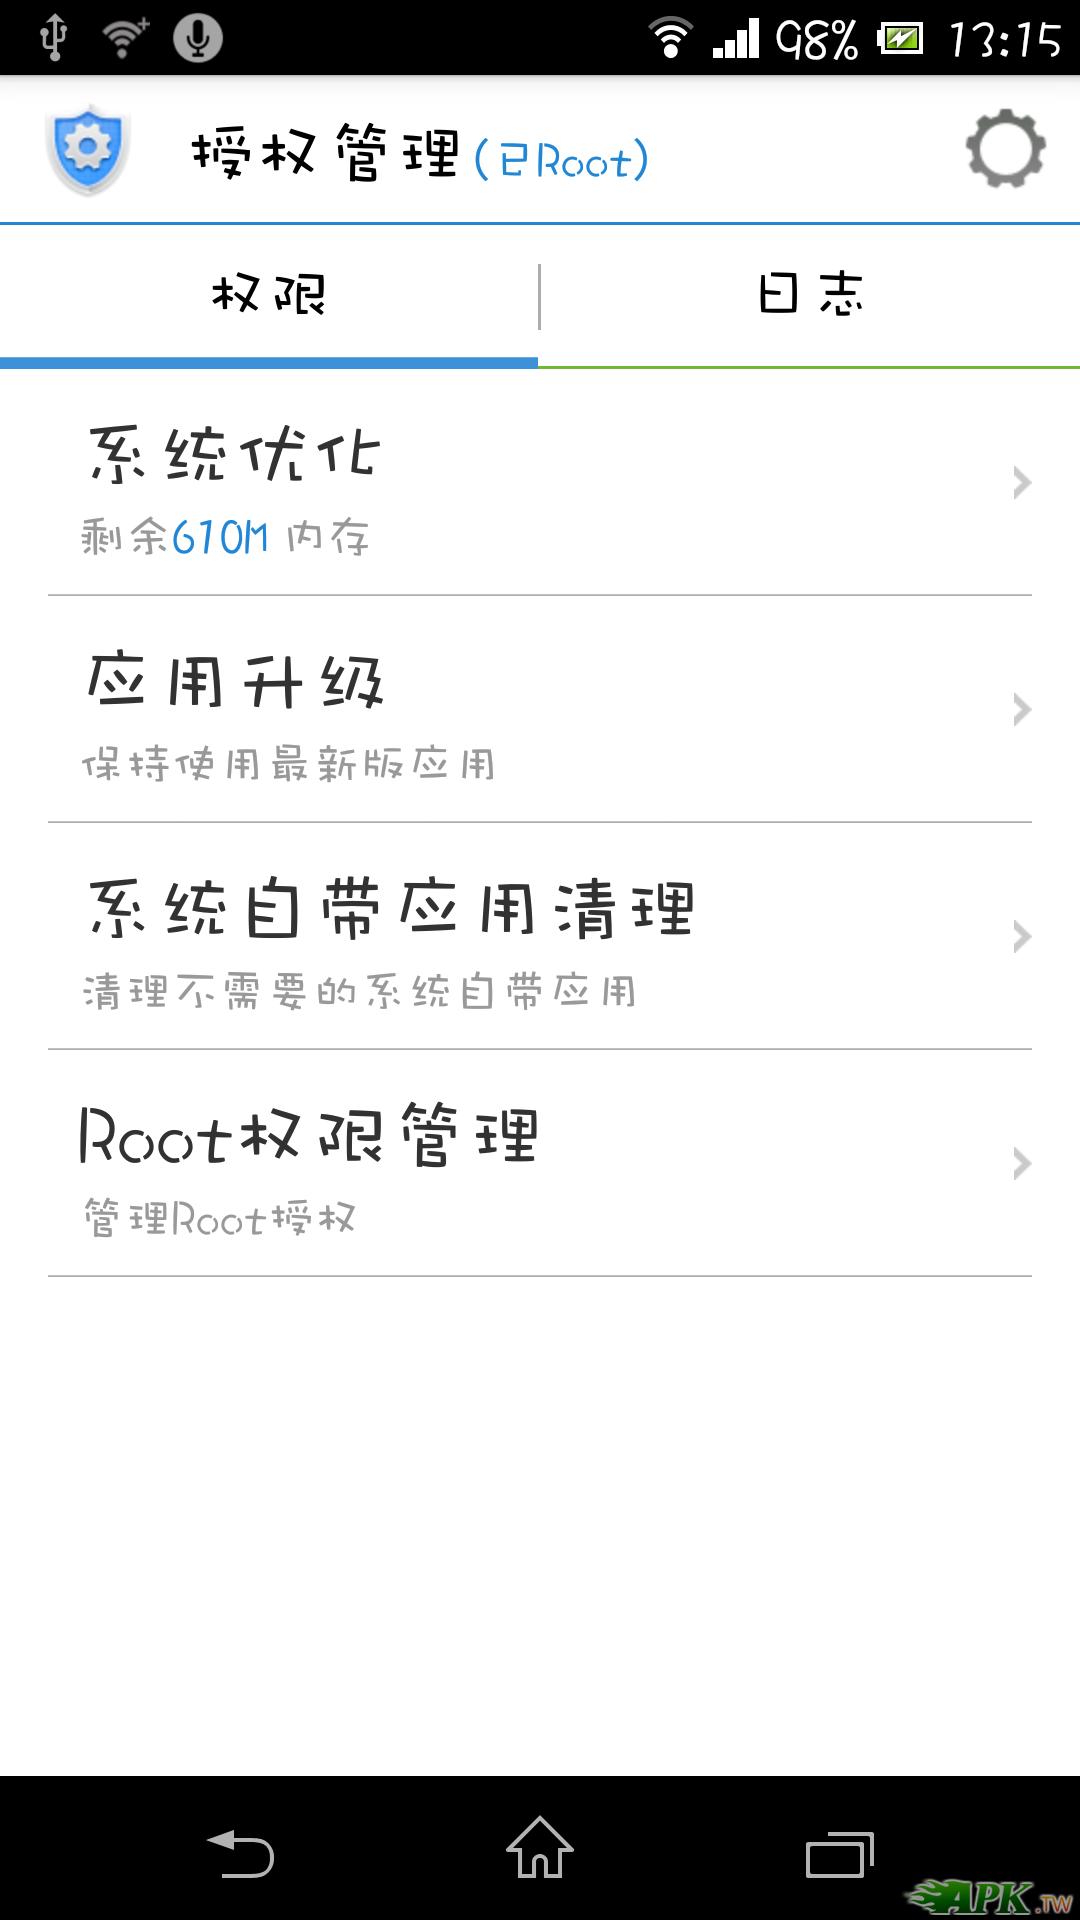 Screenshot_2013-08-28-13-15-48.png